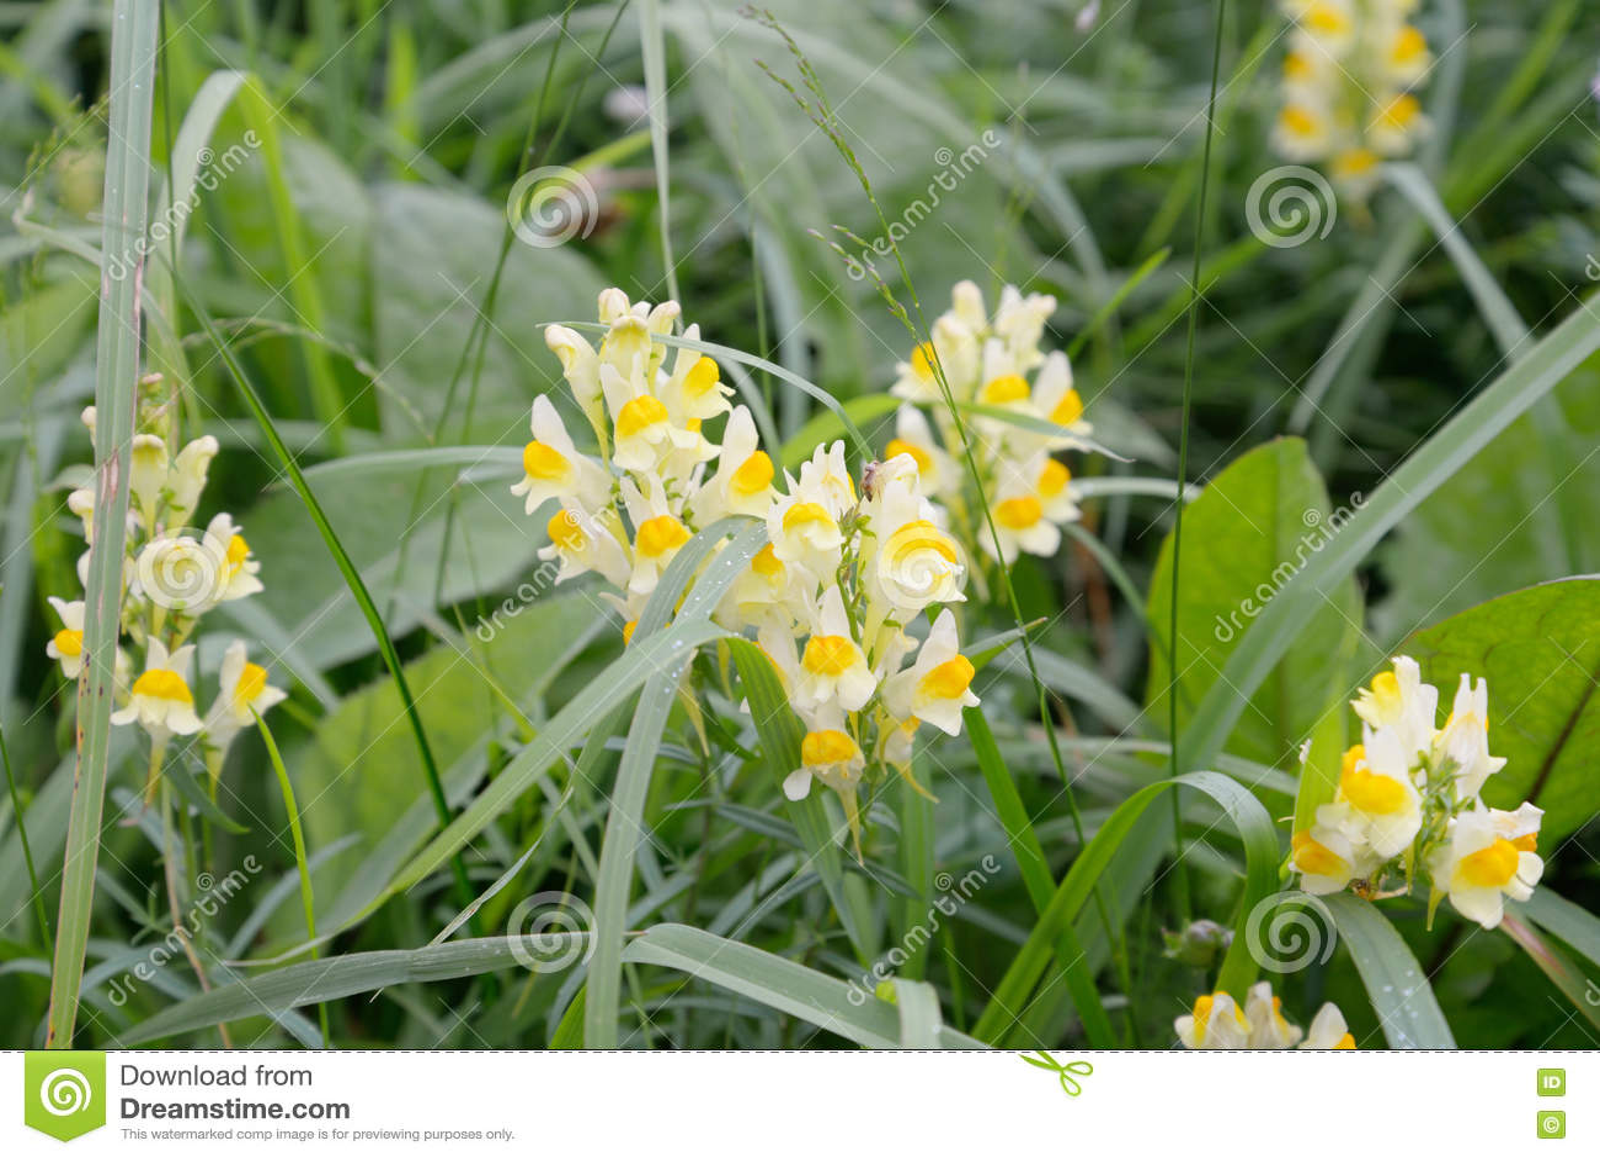 Toadflax commun, Lat Linaria vulgaris